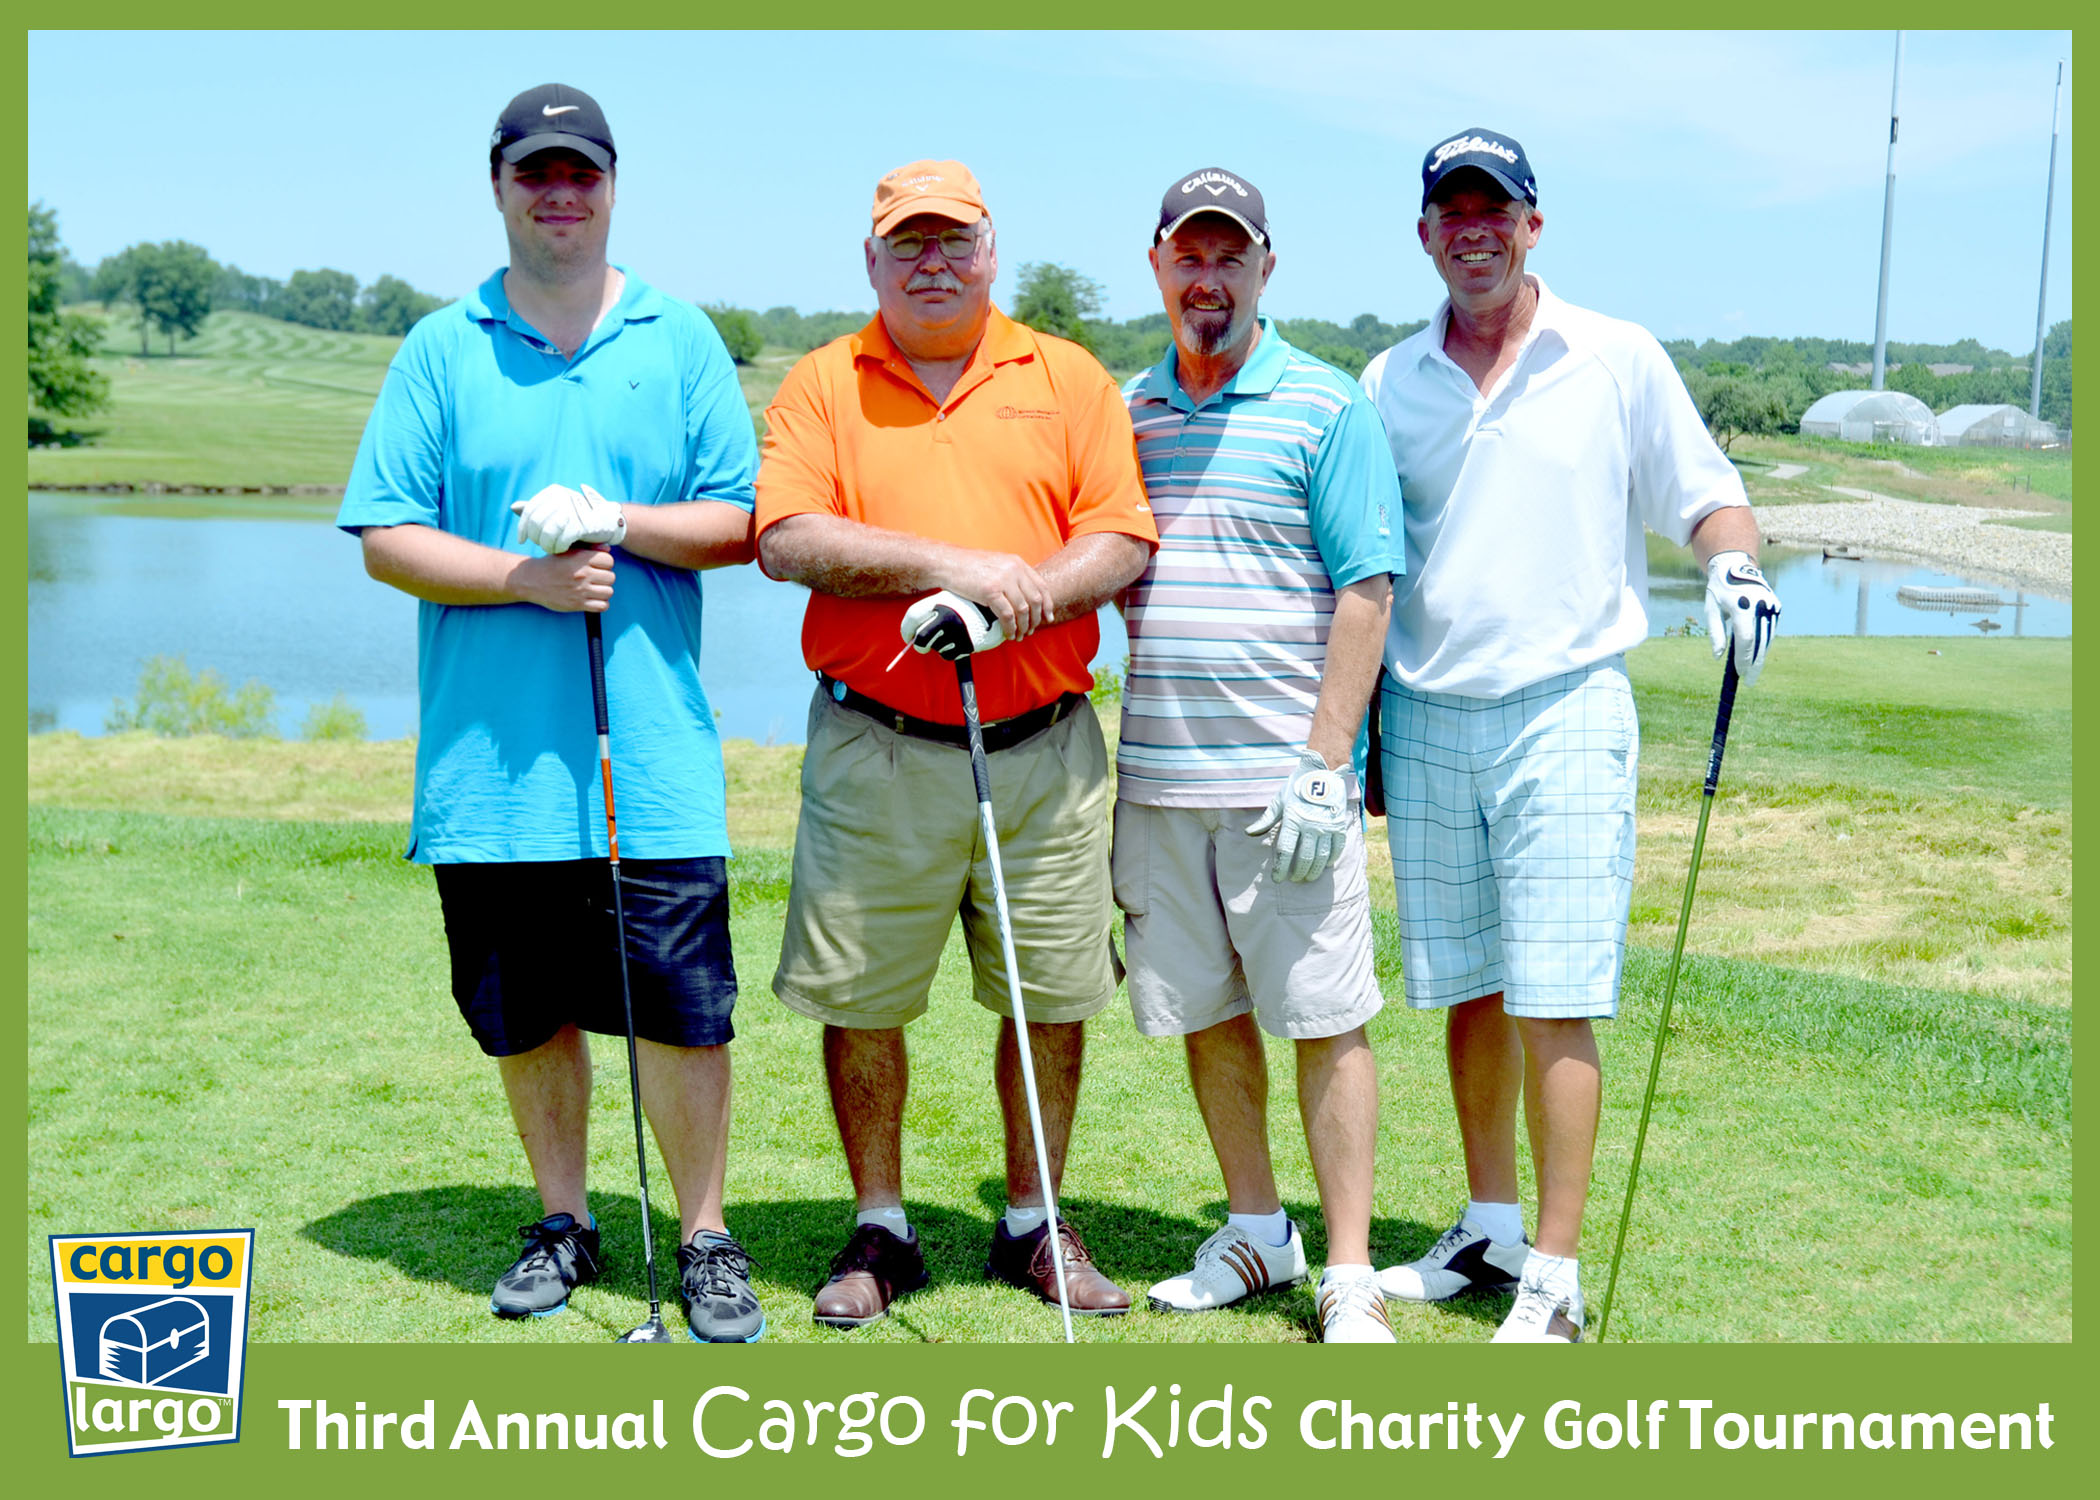 4 Single Golfers